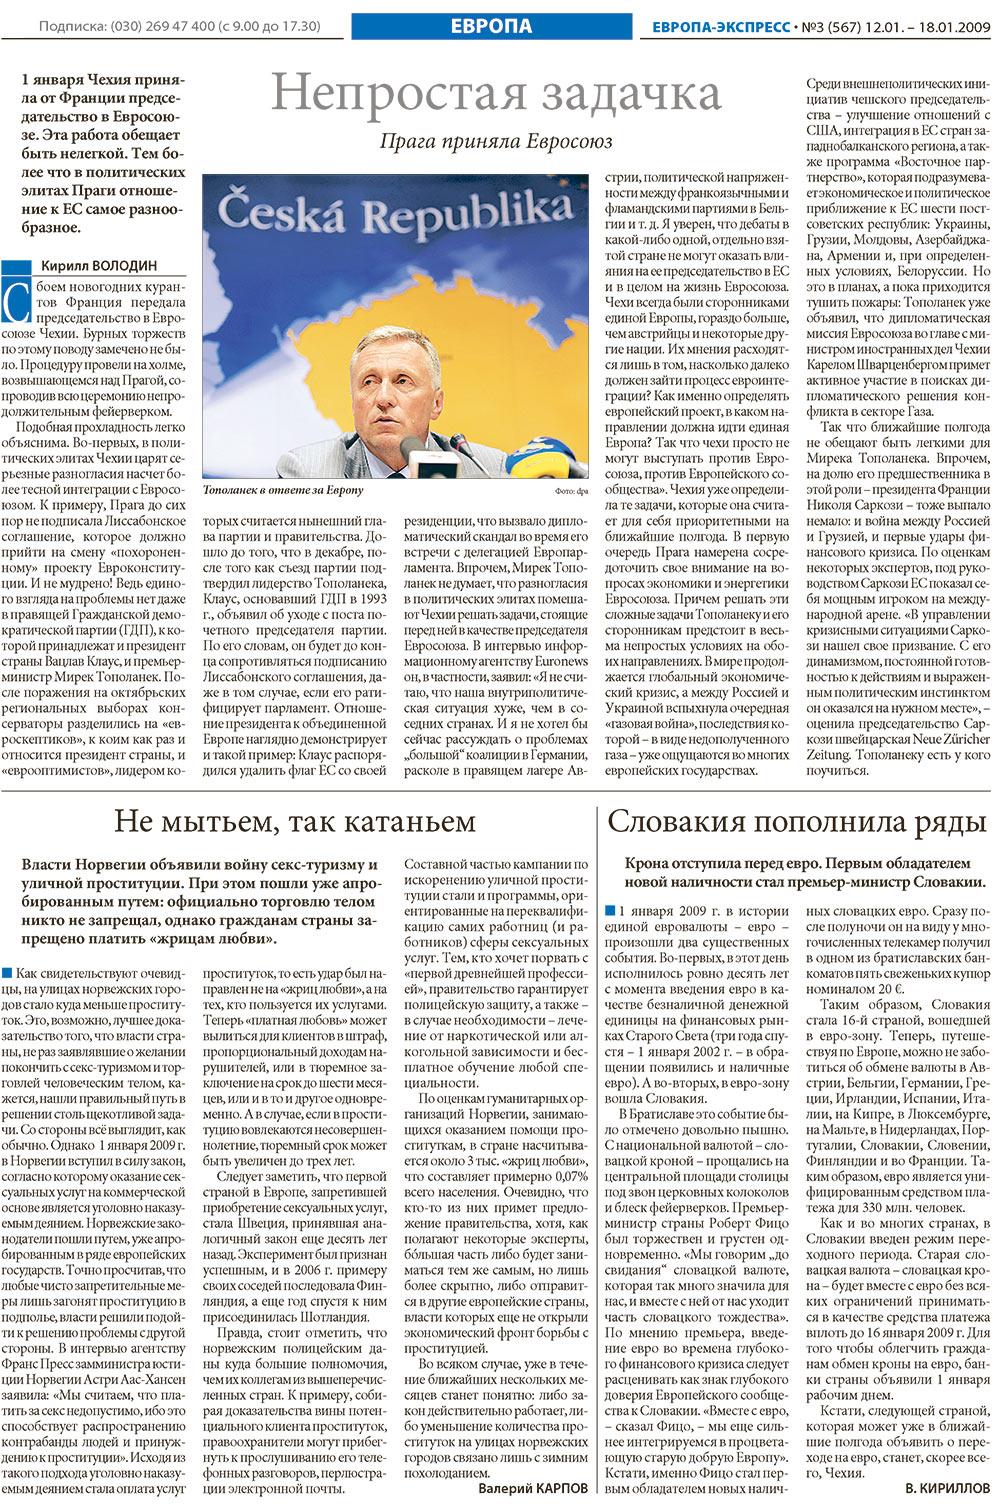 Европа экспресс (газета). 2009 год, номер 1, стр. 8